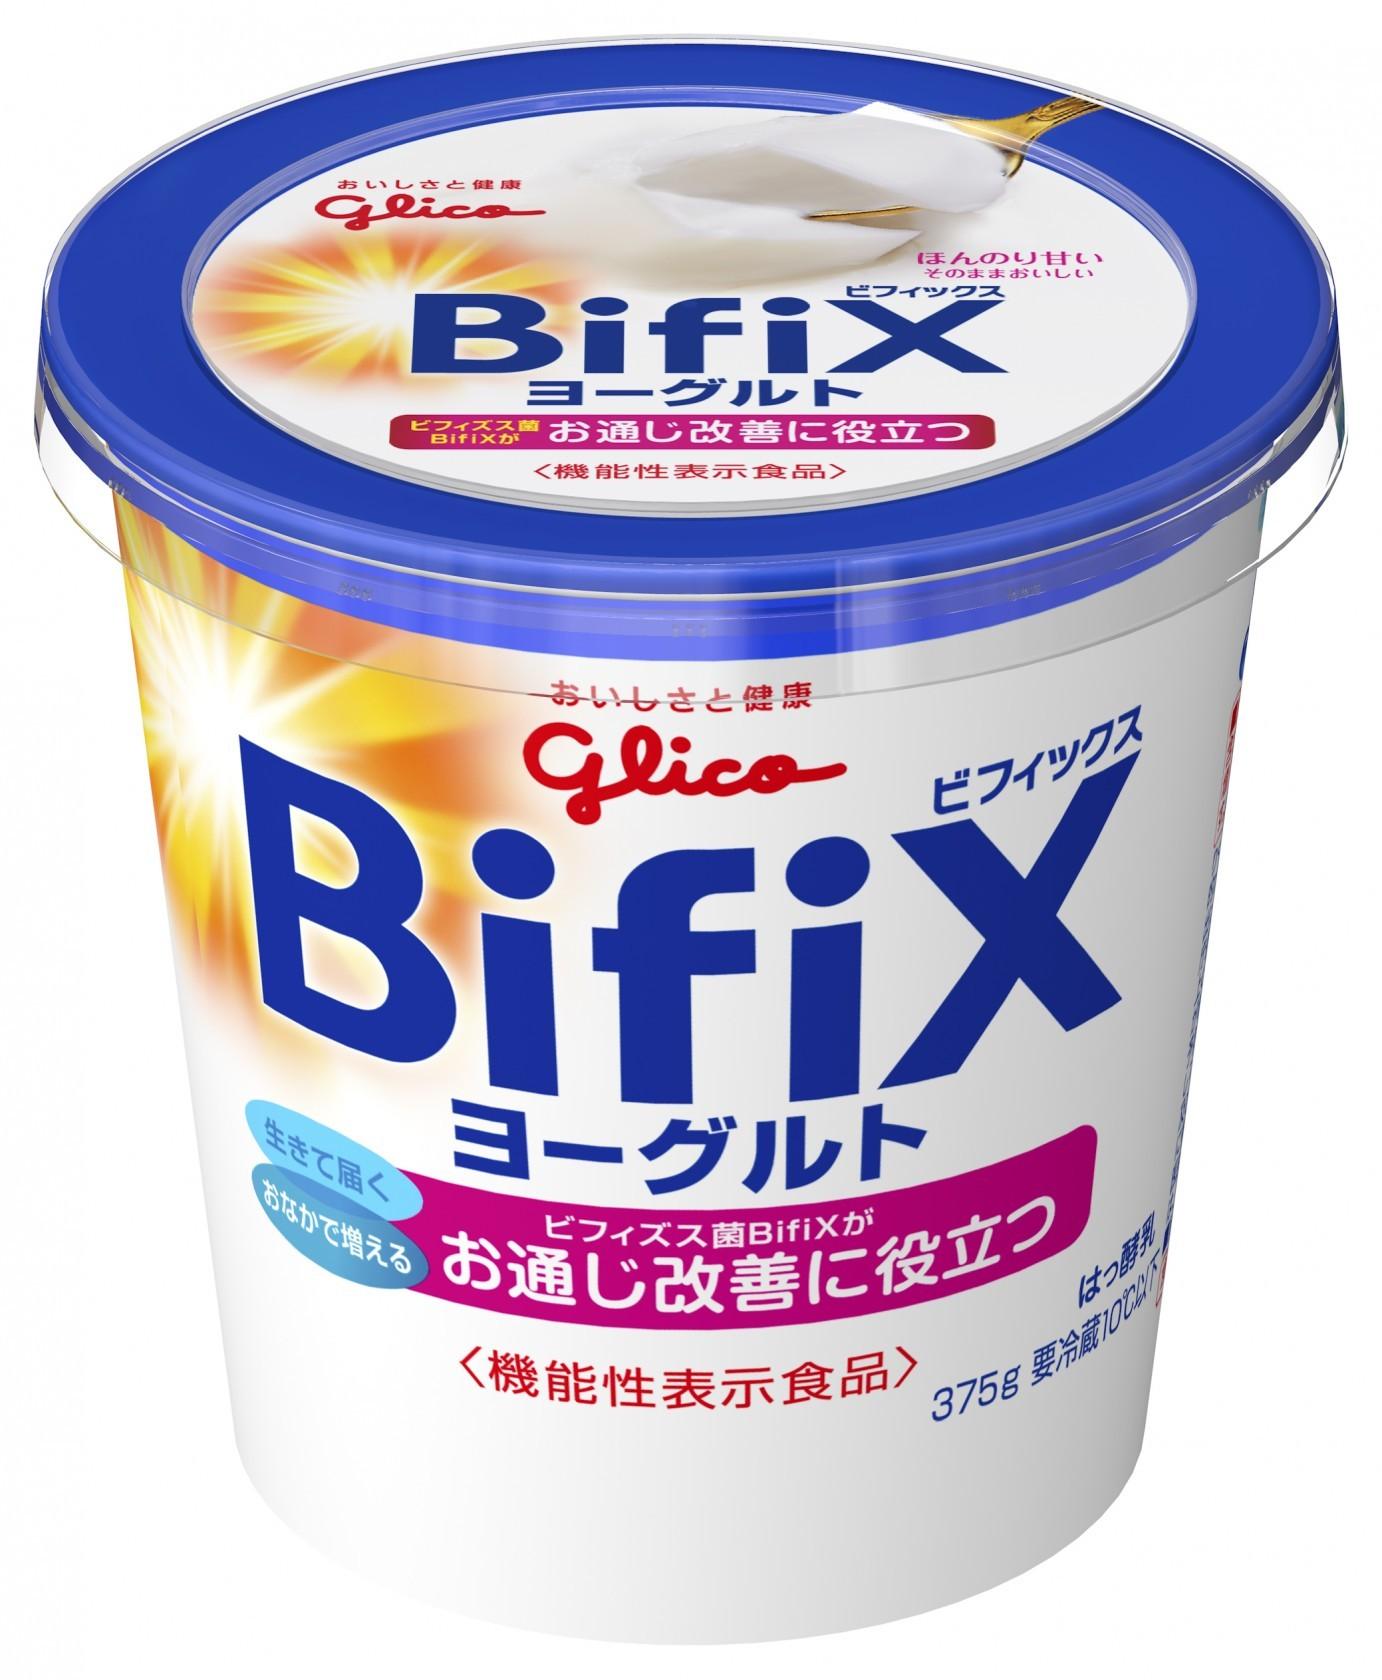 BifiX ヨーグルト 375gのパッケージ